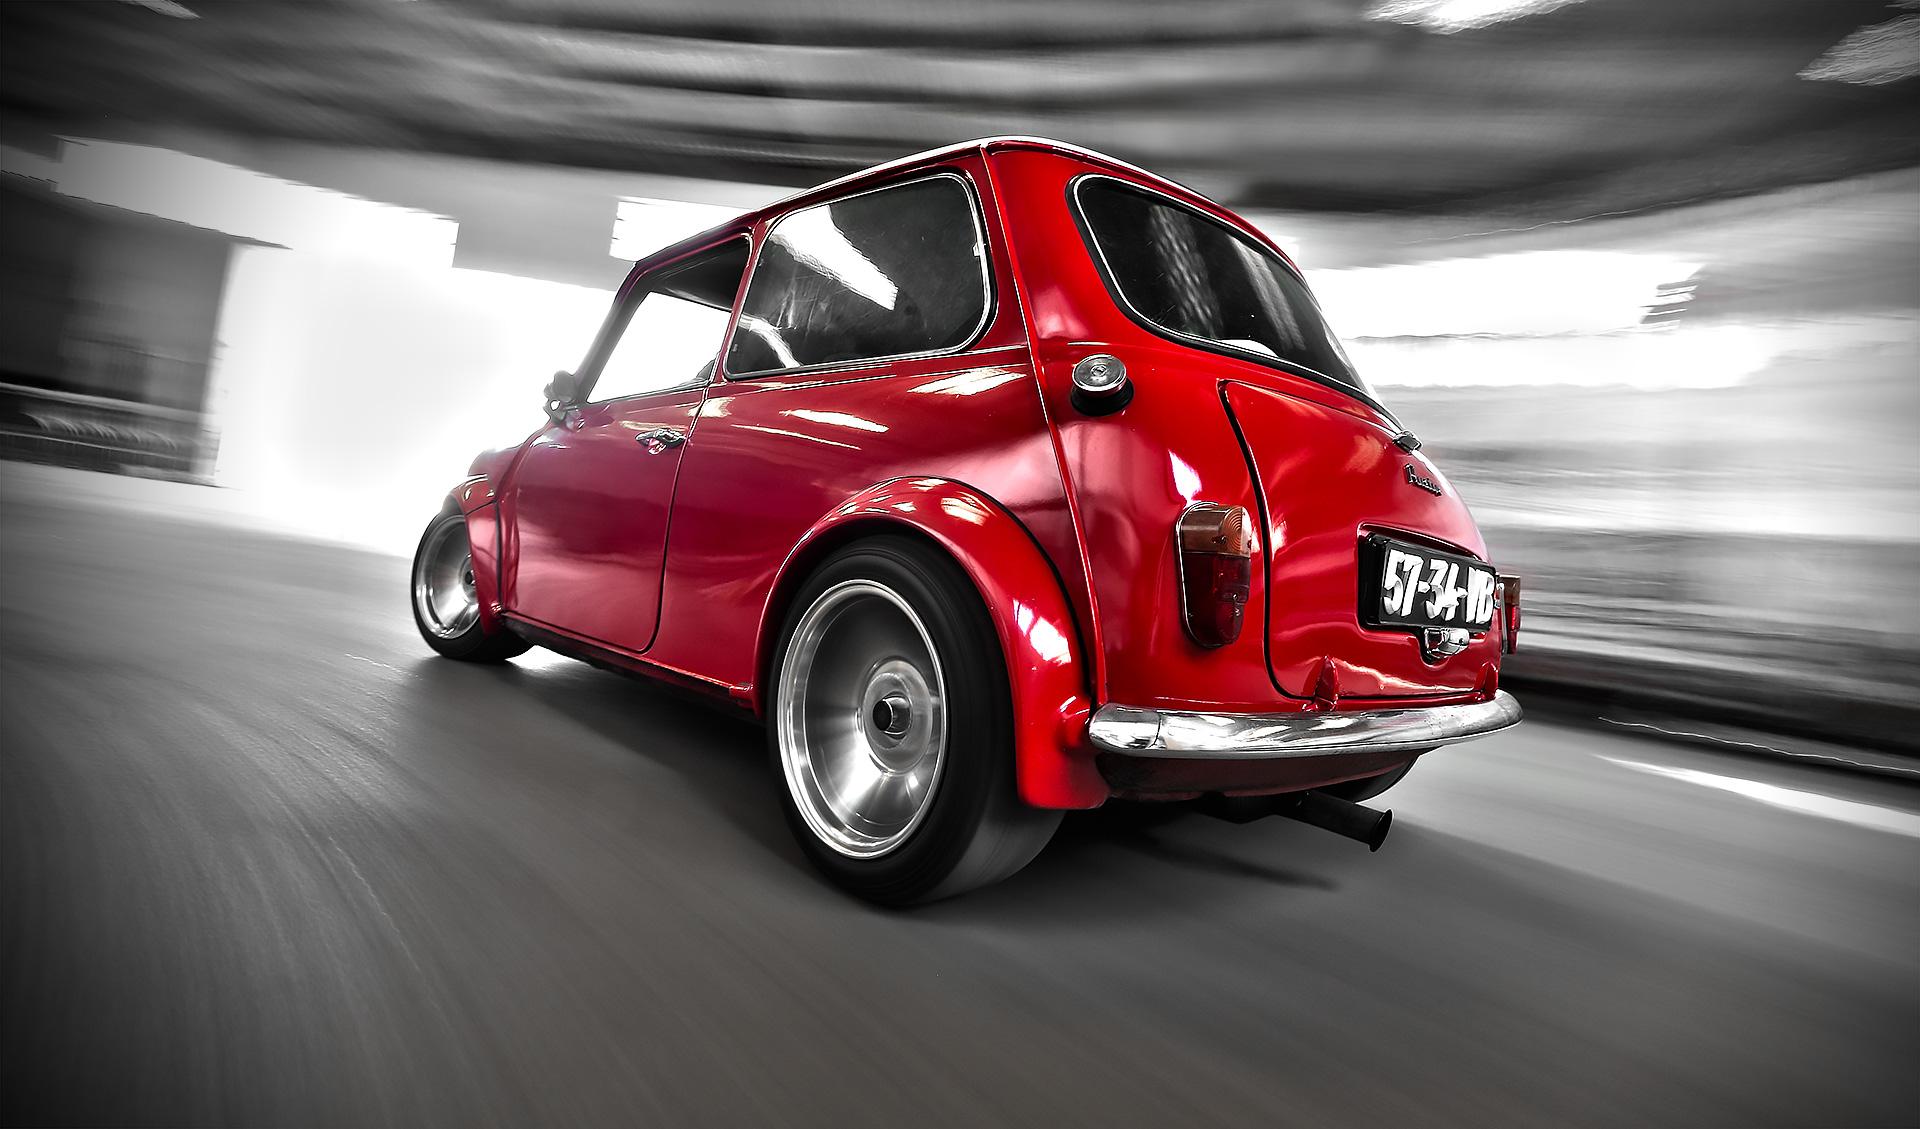 Classic Mini 1000 Red 9 Pedro Mota Fotografia